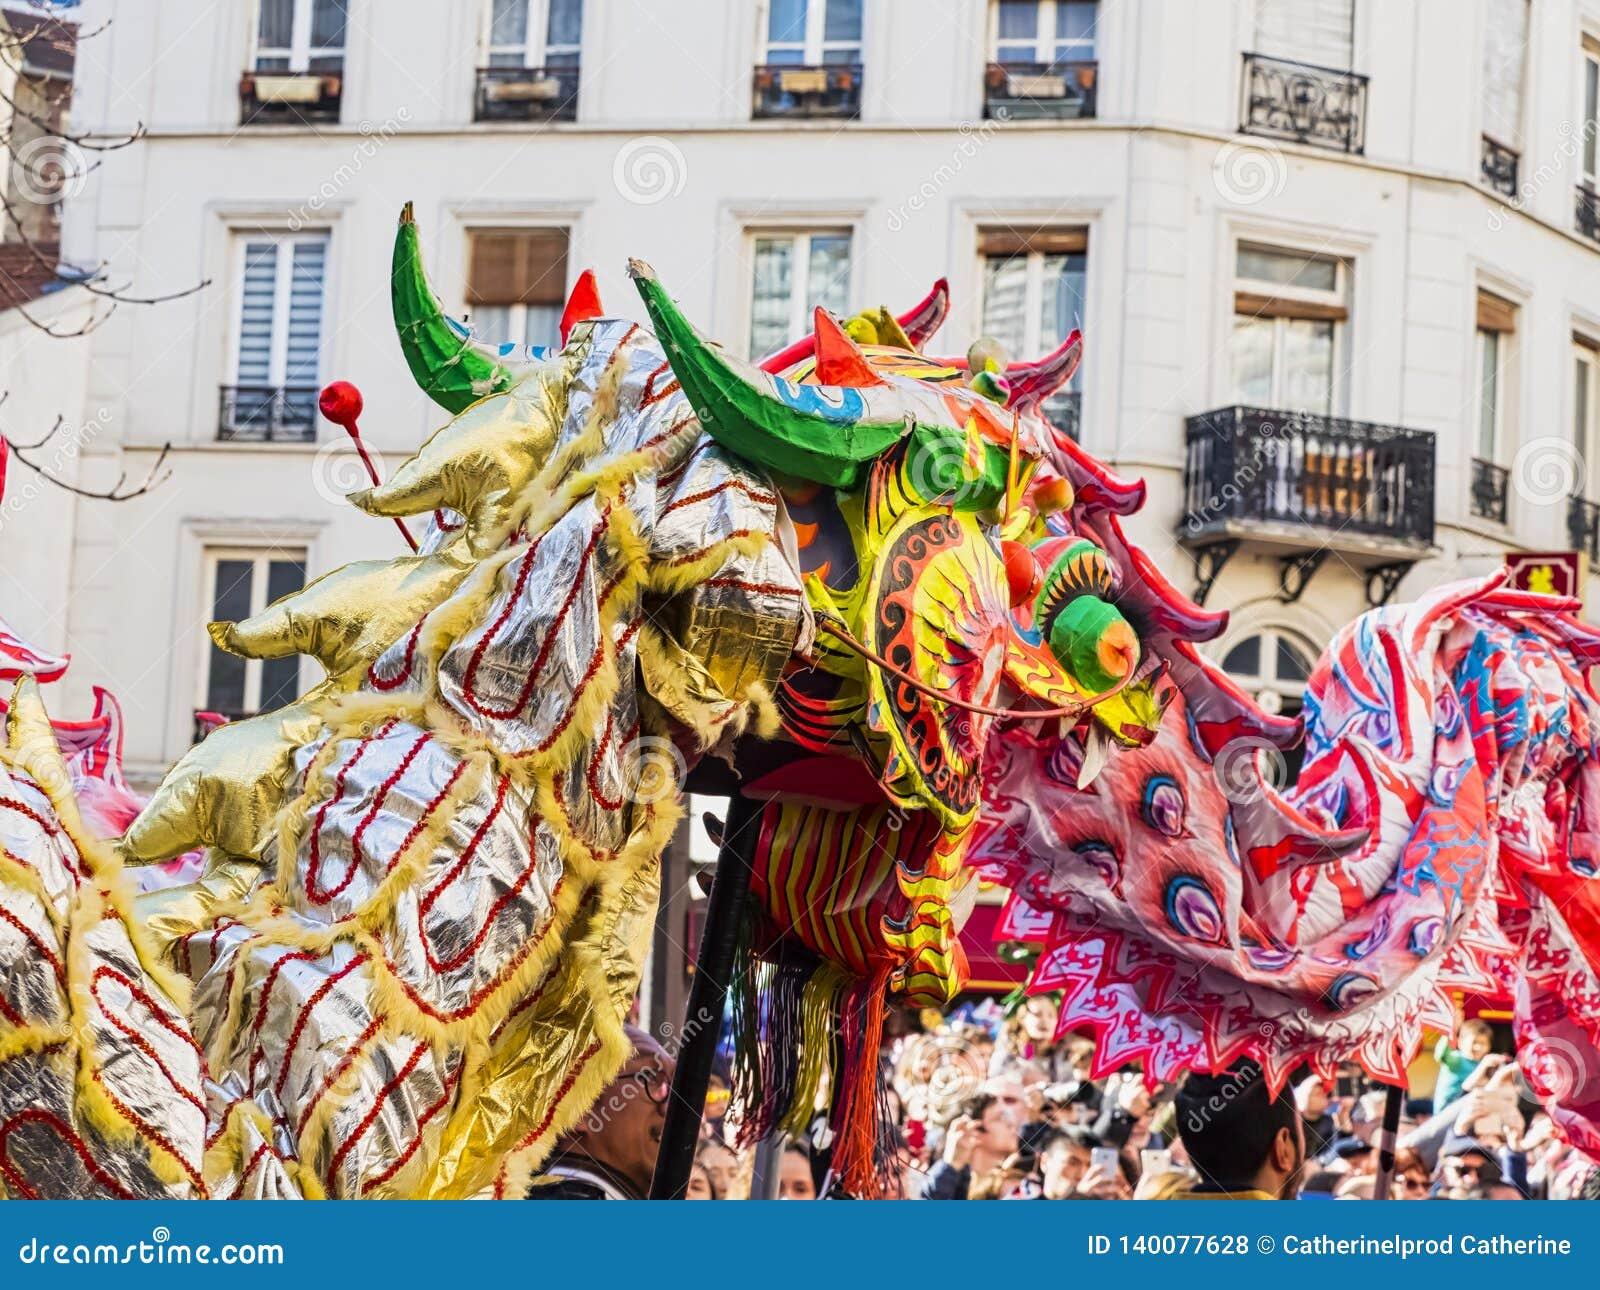 Chinese new year 2019 Paris France - dragon dancing